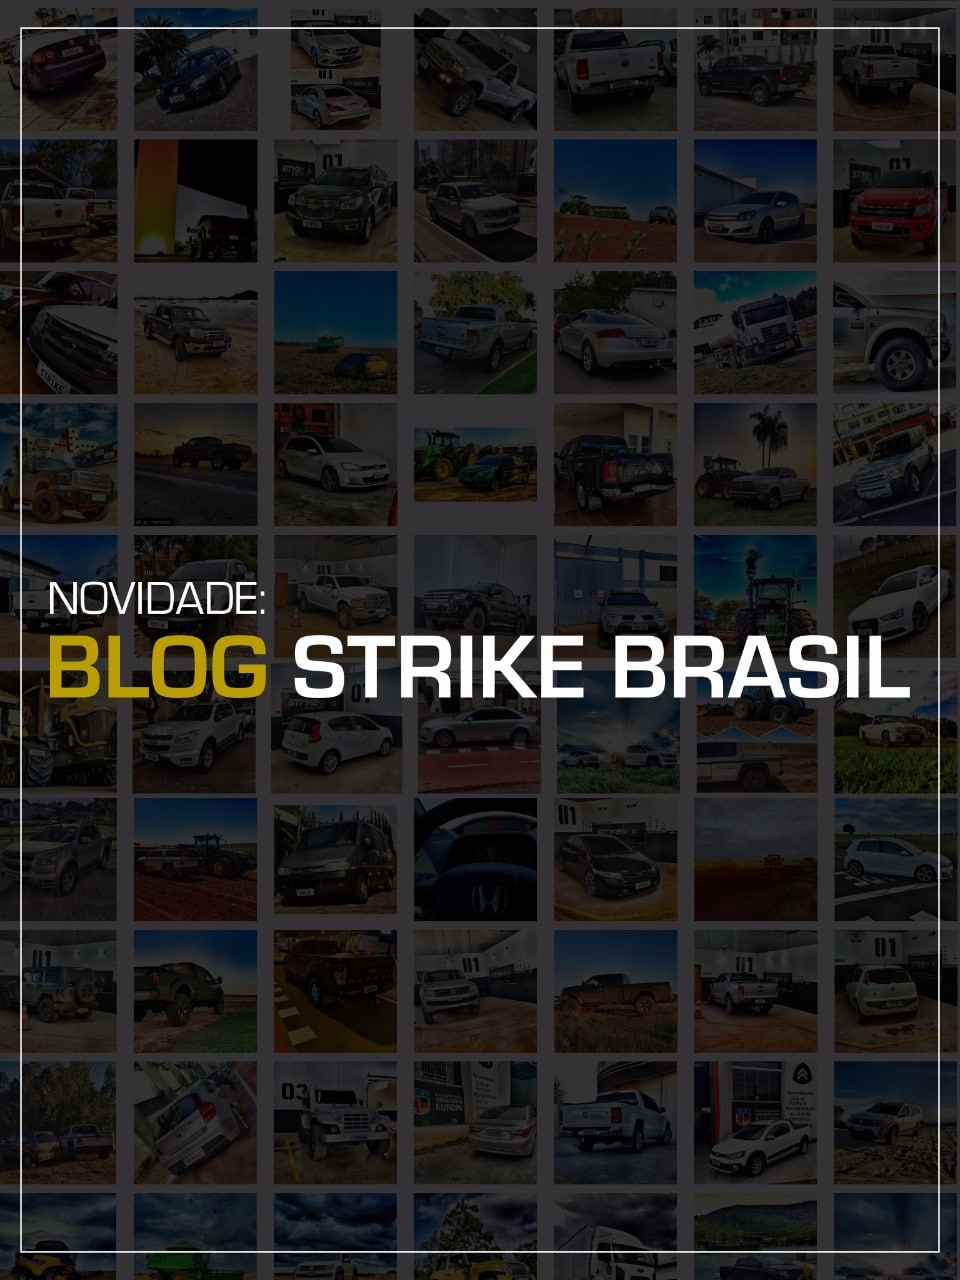 capa lançamento blog srike brasil